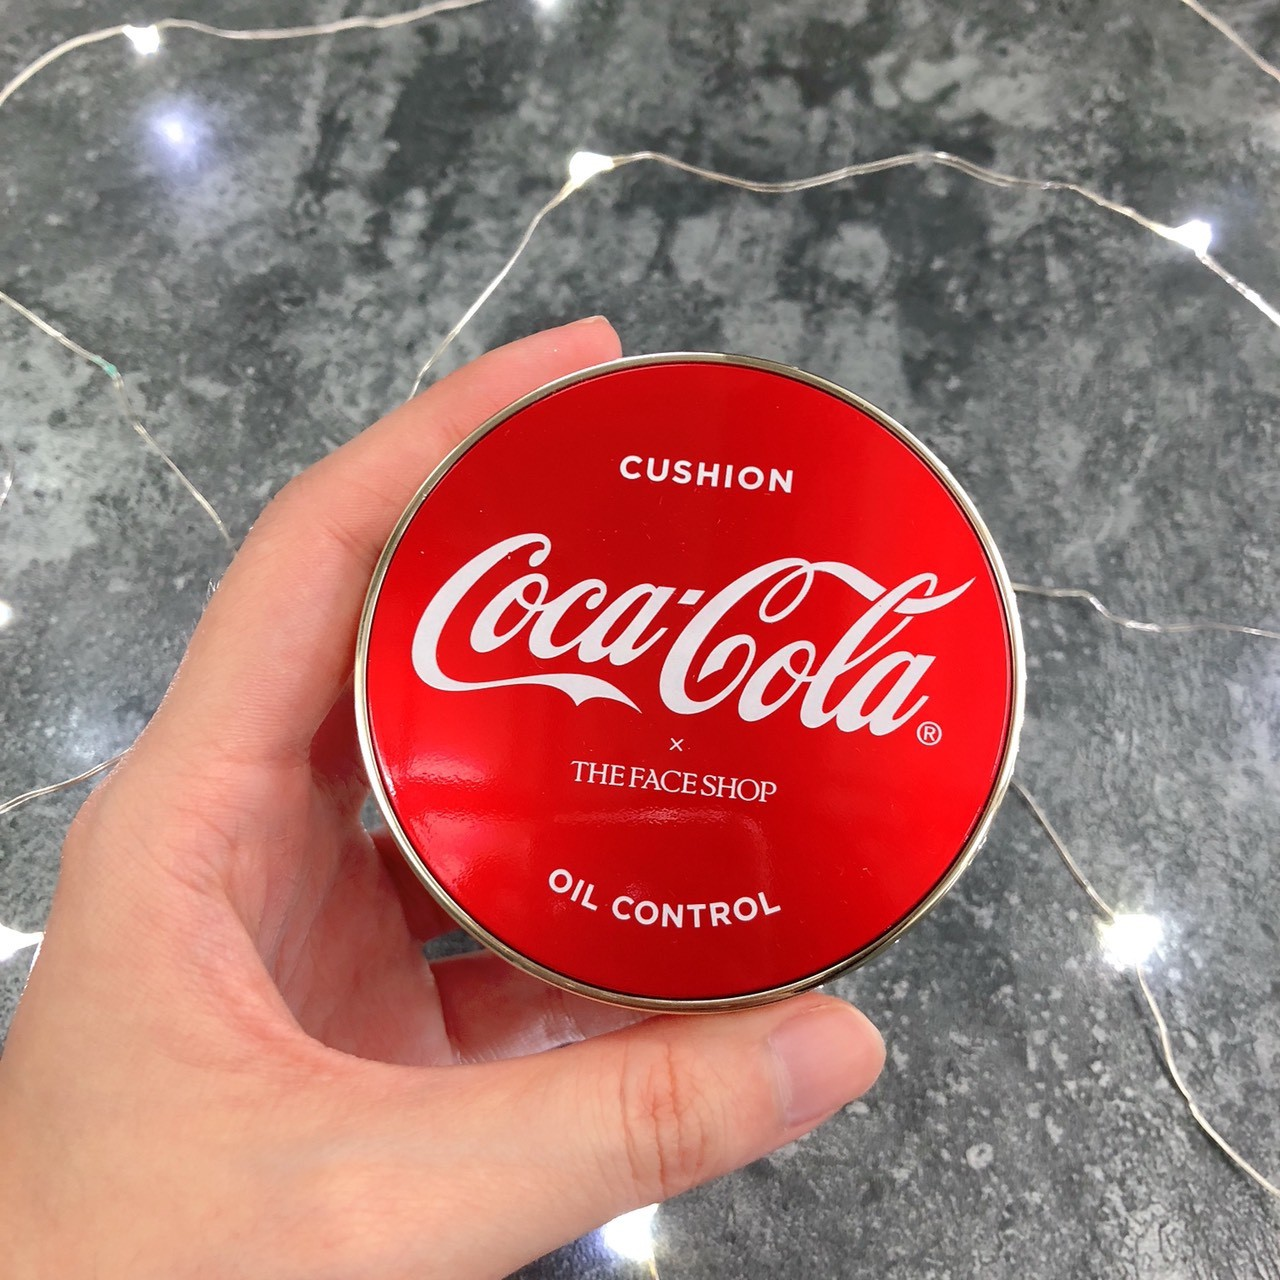 The Face Shop x Coca Cola Oil Control Cushion